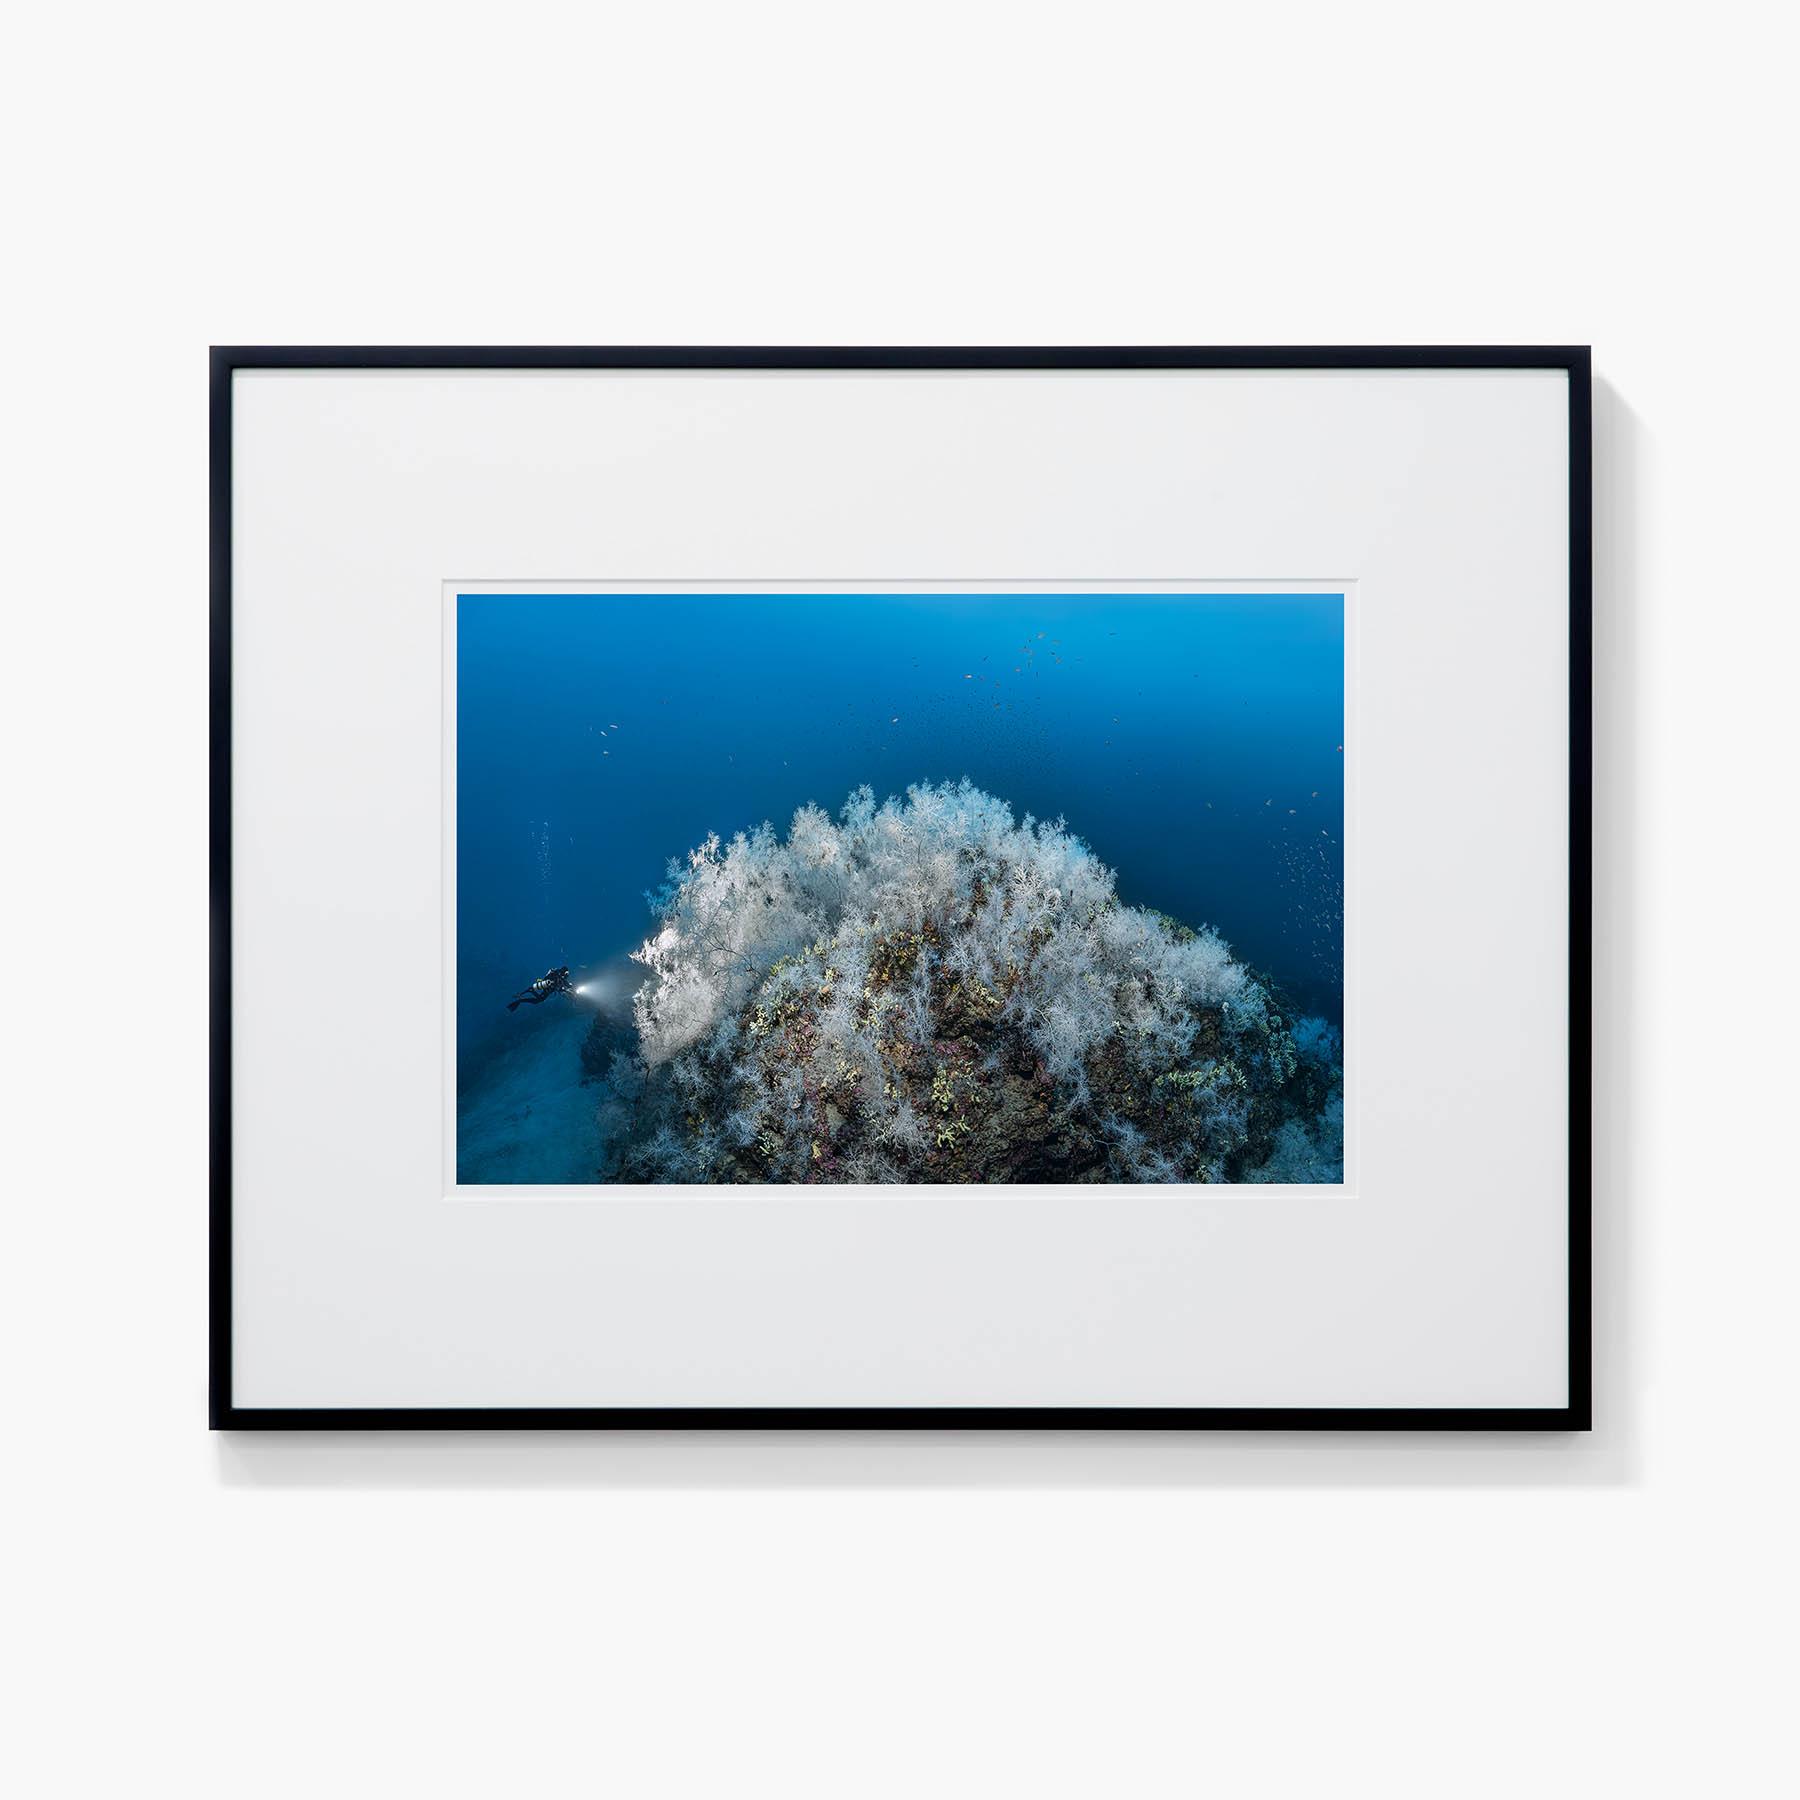 Tirage Laurent Ballesta La fôret de corail noir, Antipathella subpinnata